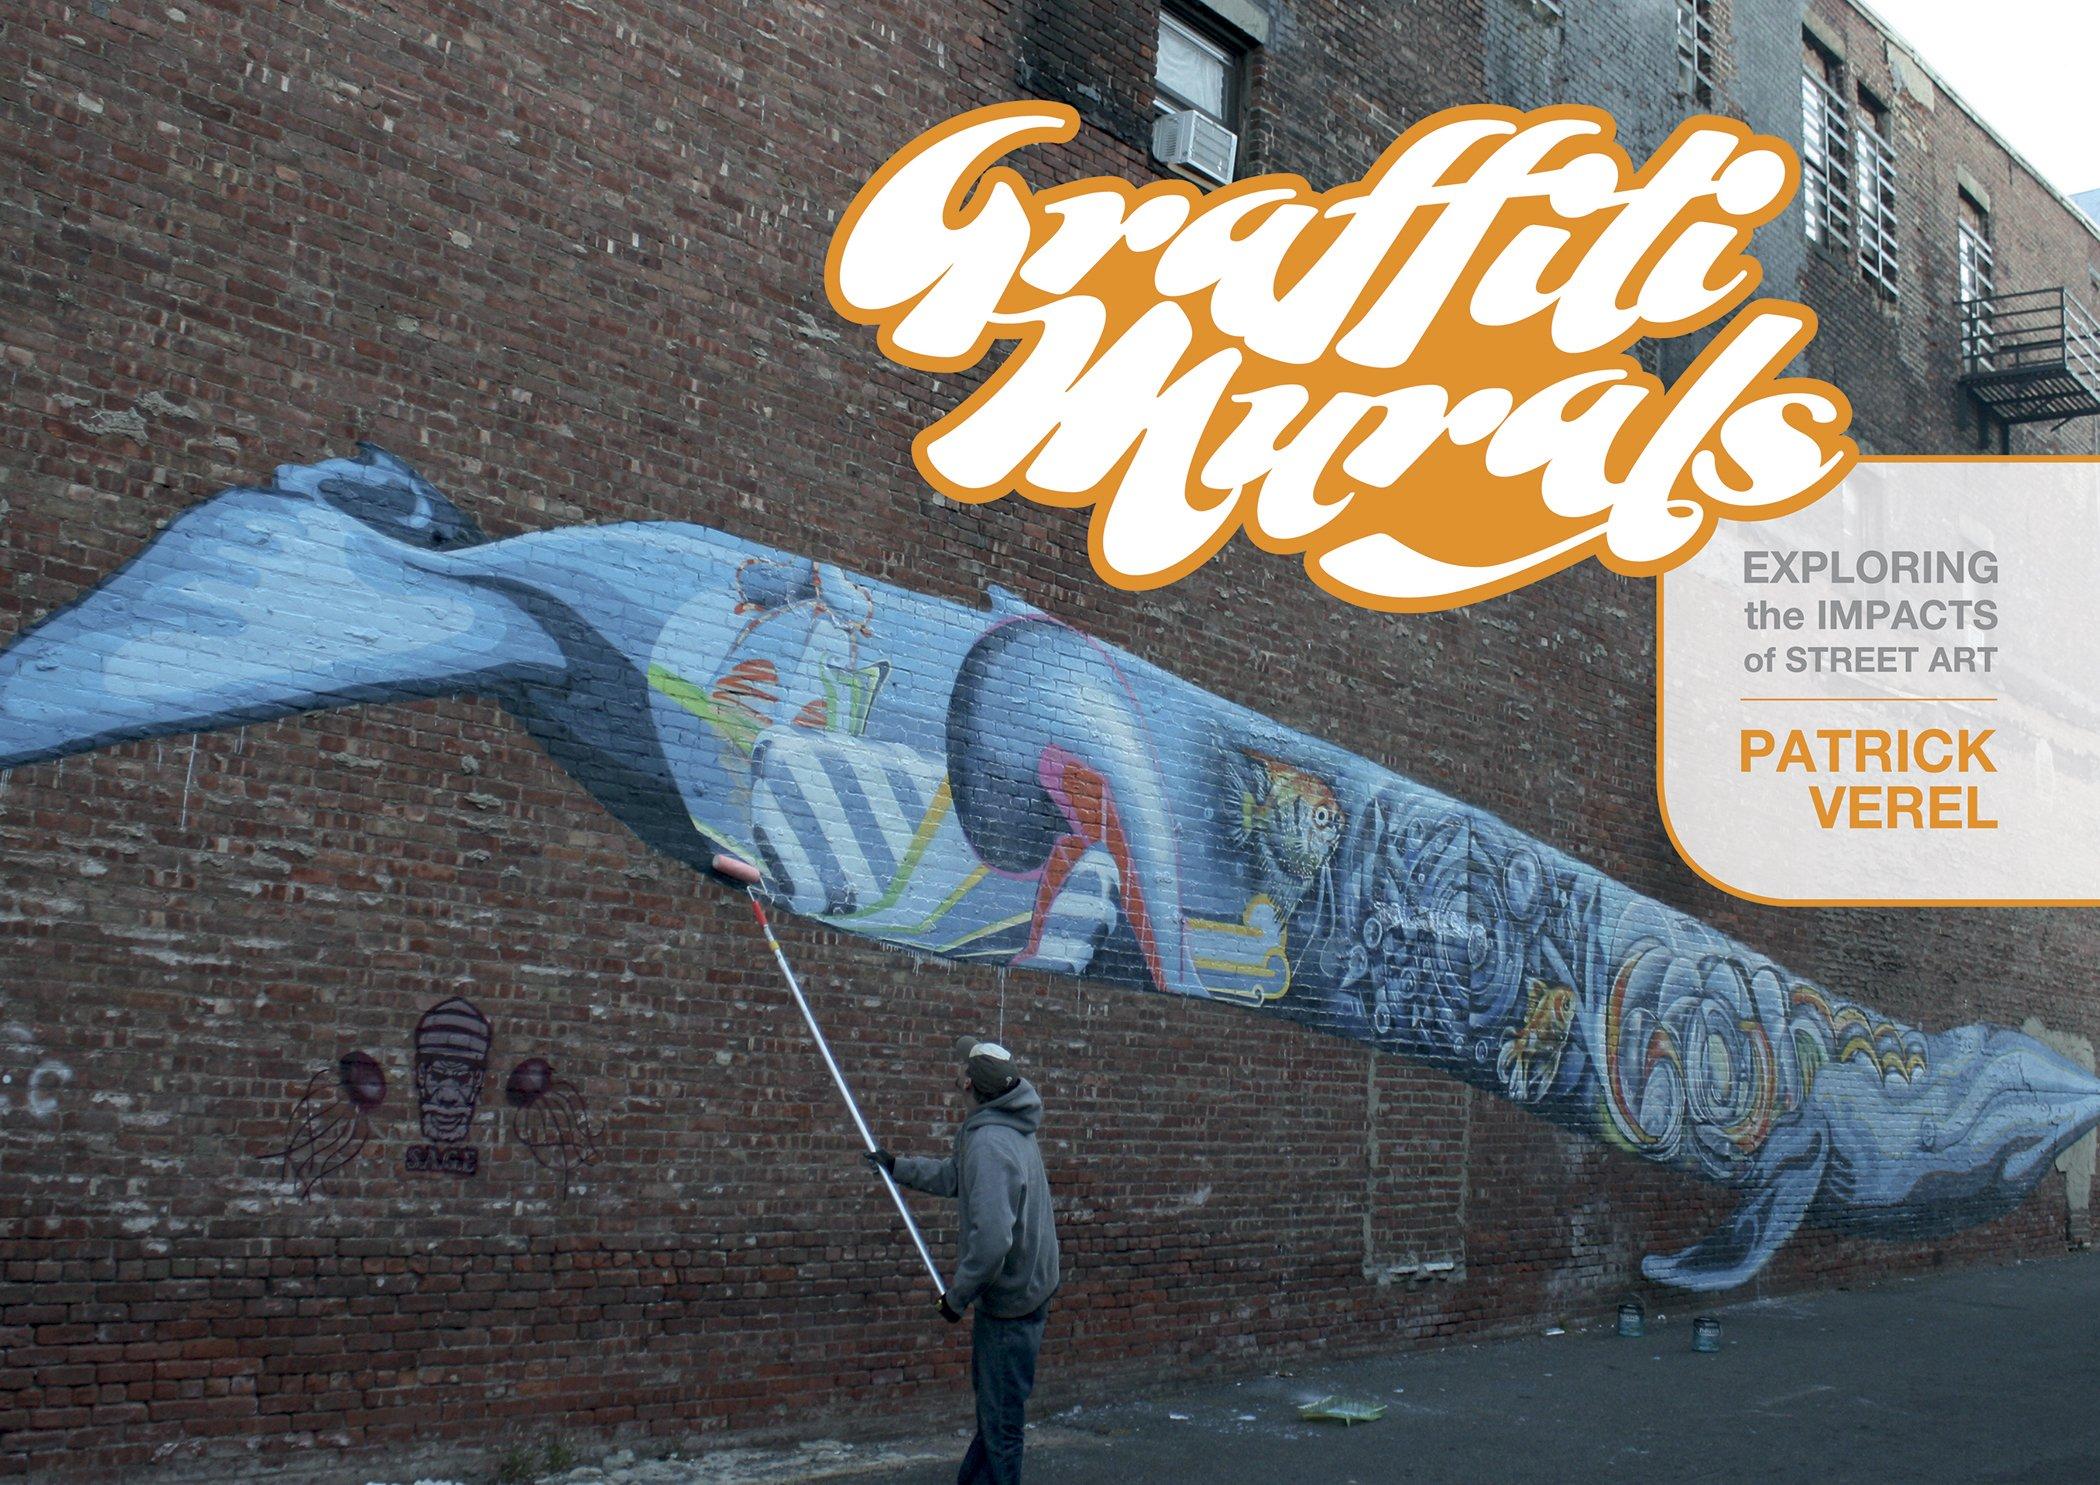 Graffiti Murals Exploring The Impacts Of Street Art Patrick Verel